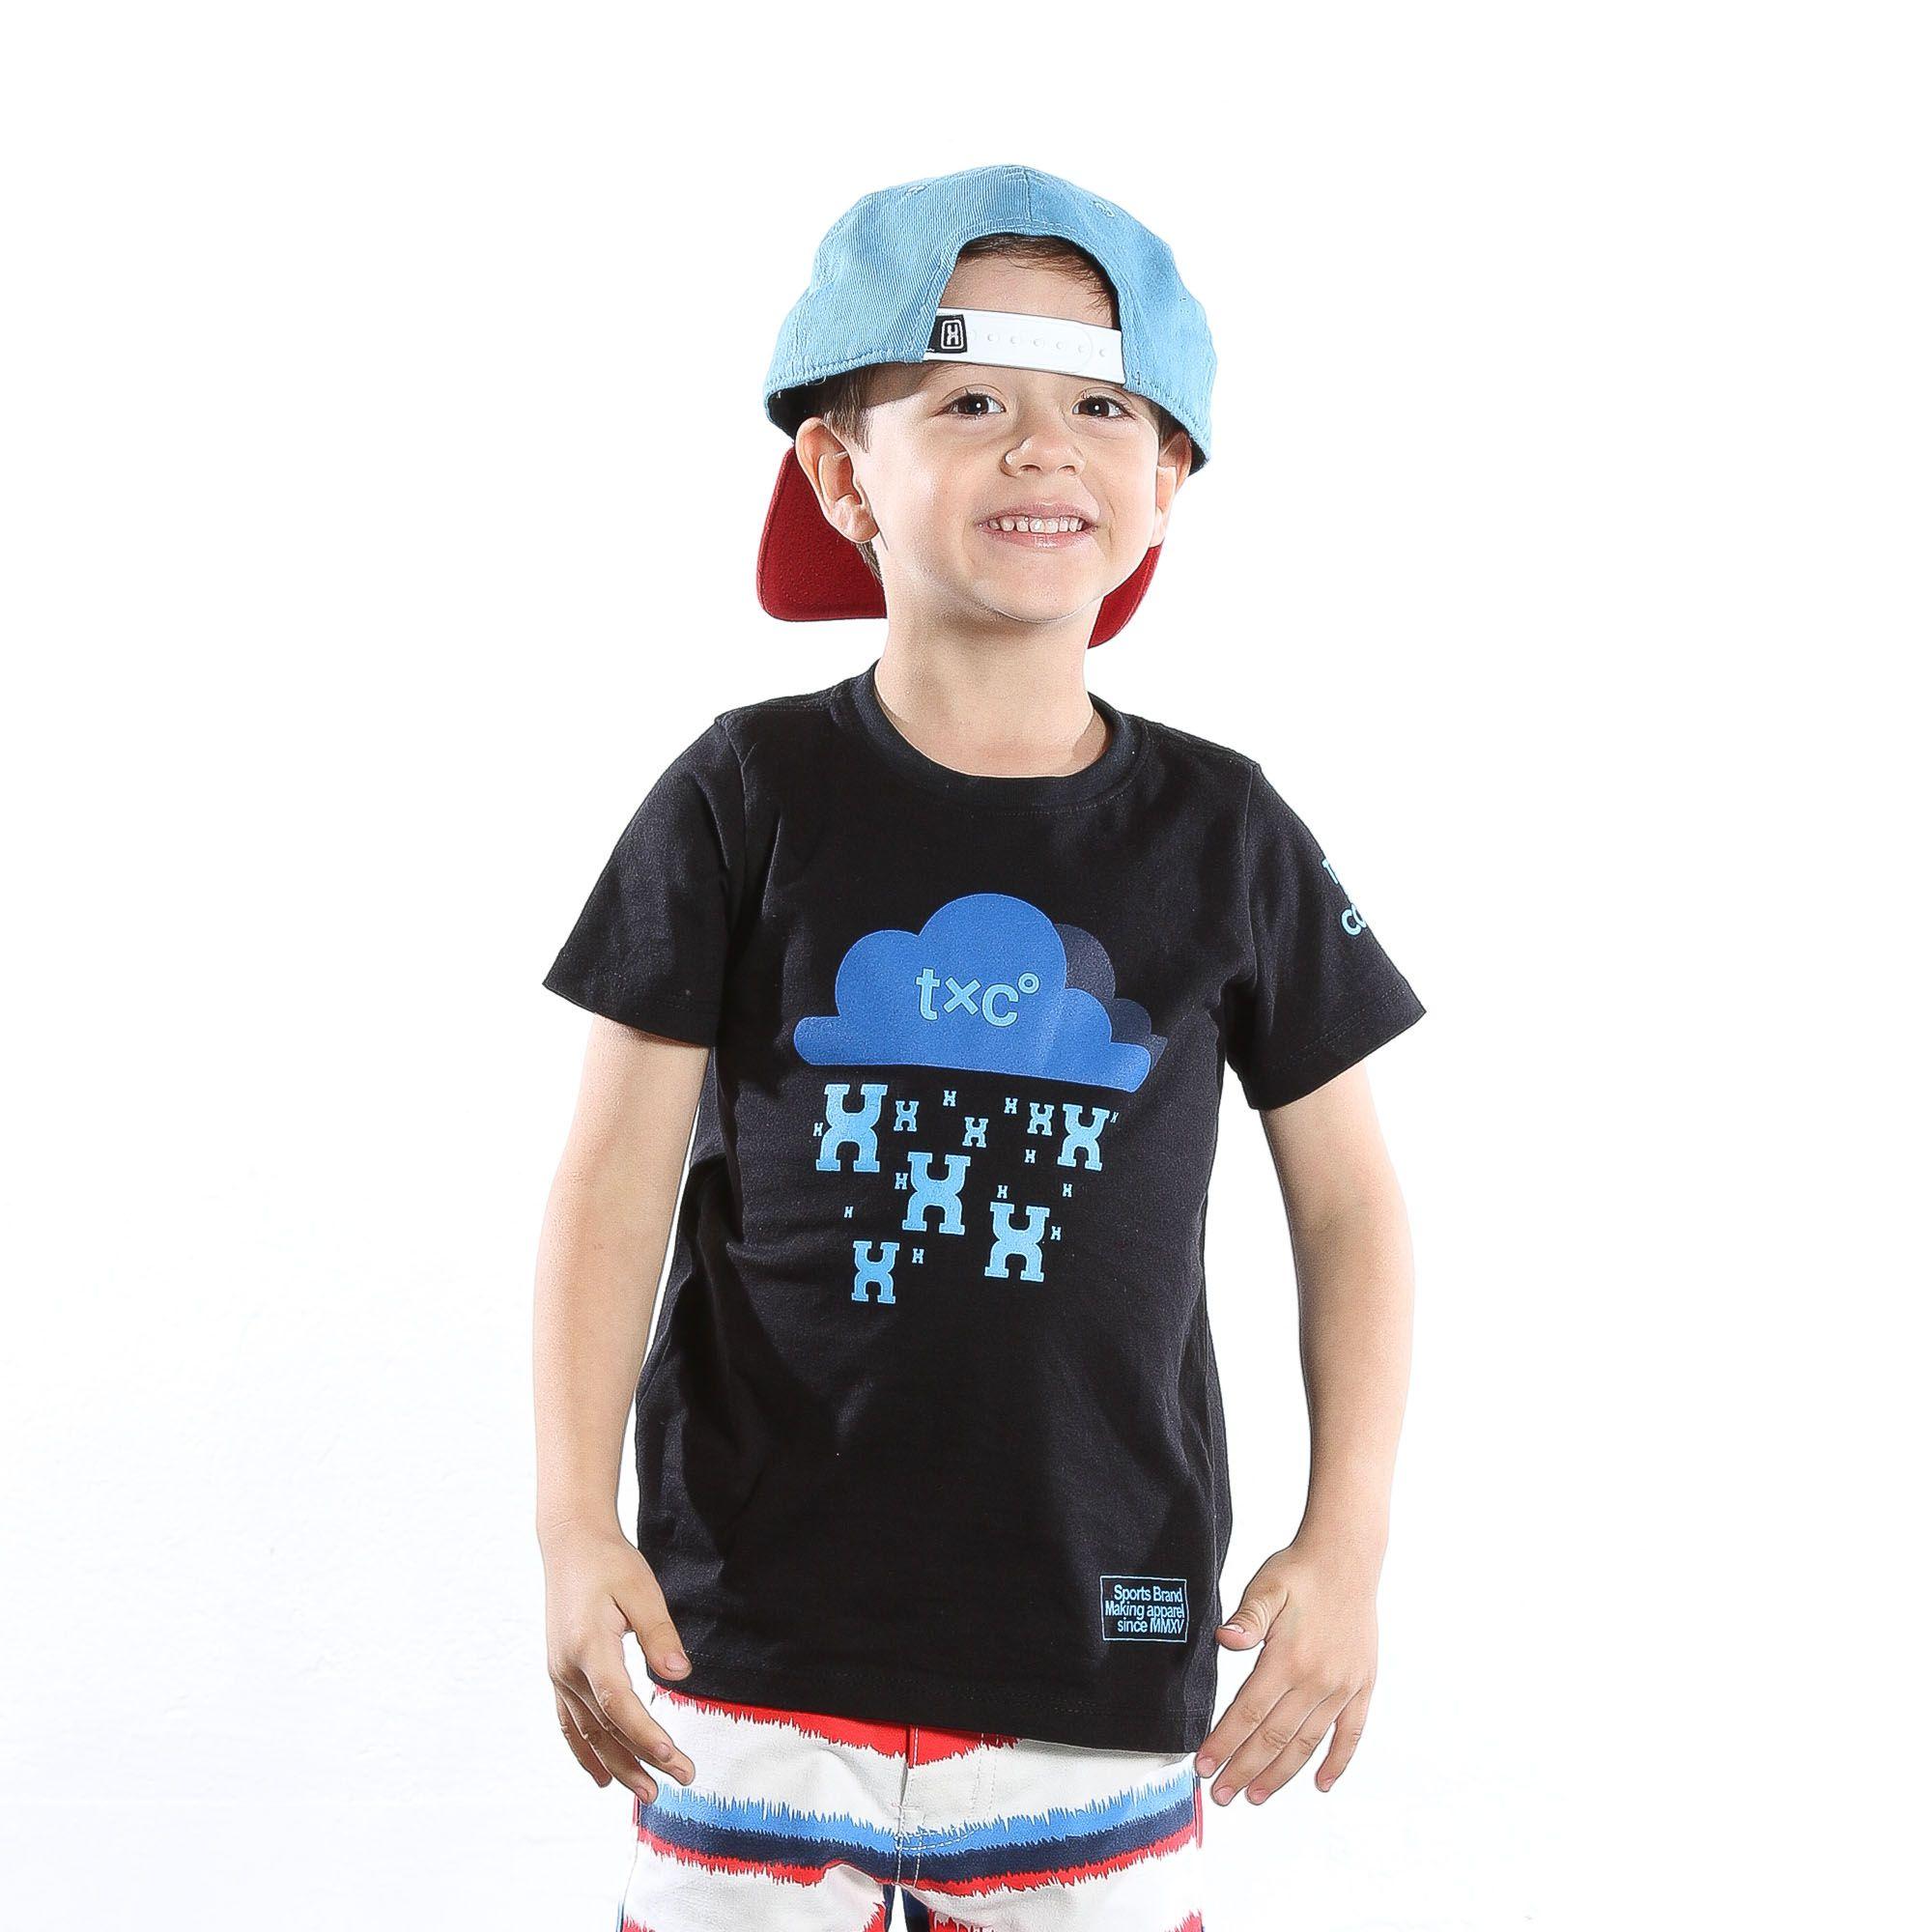 Camiseta infantil TXC 14042I